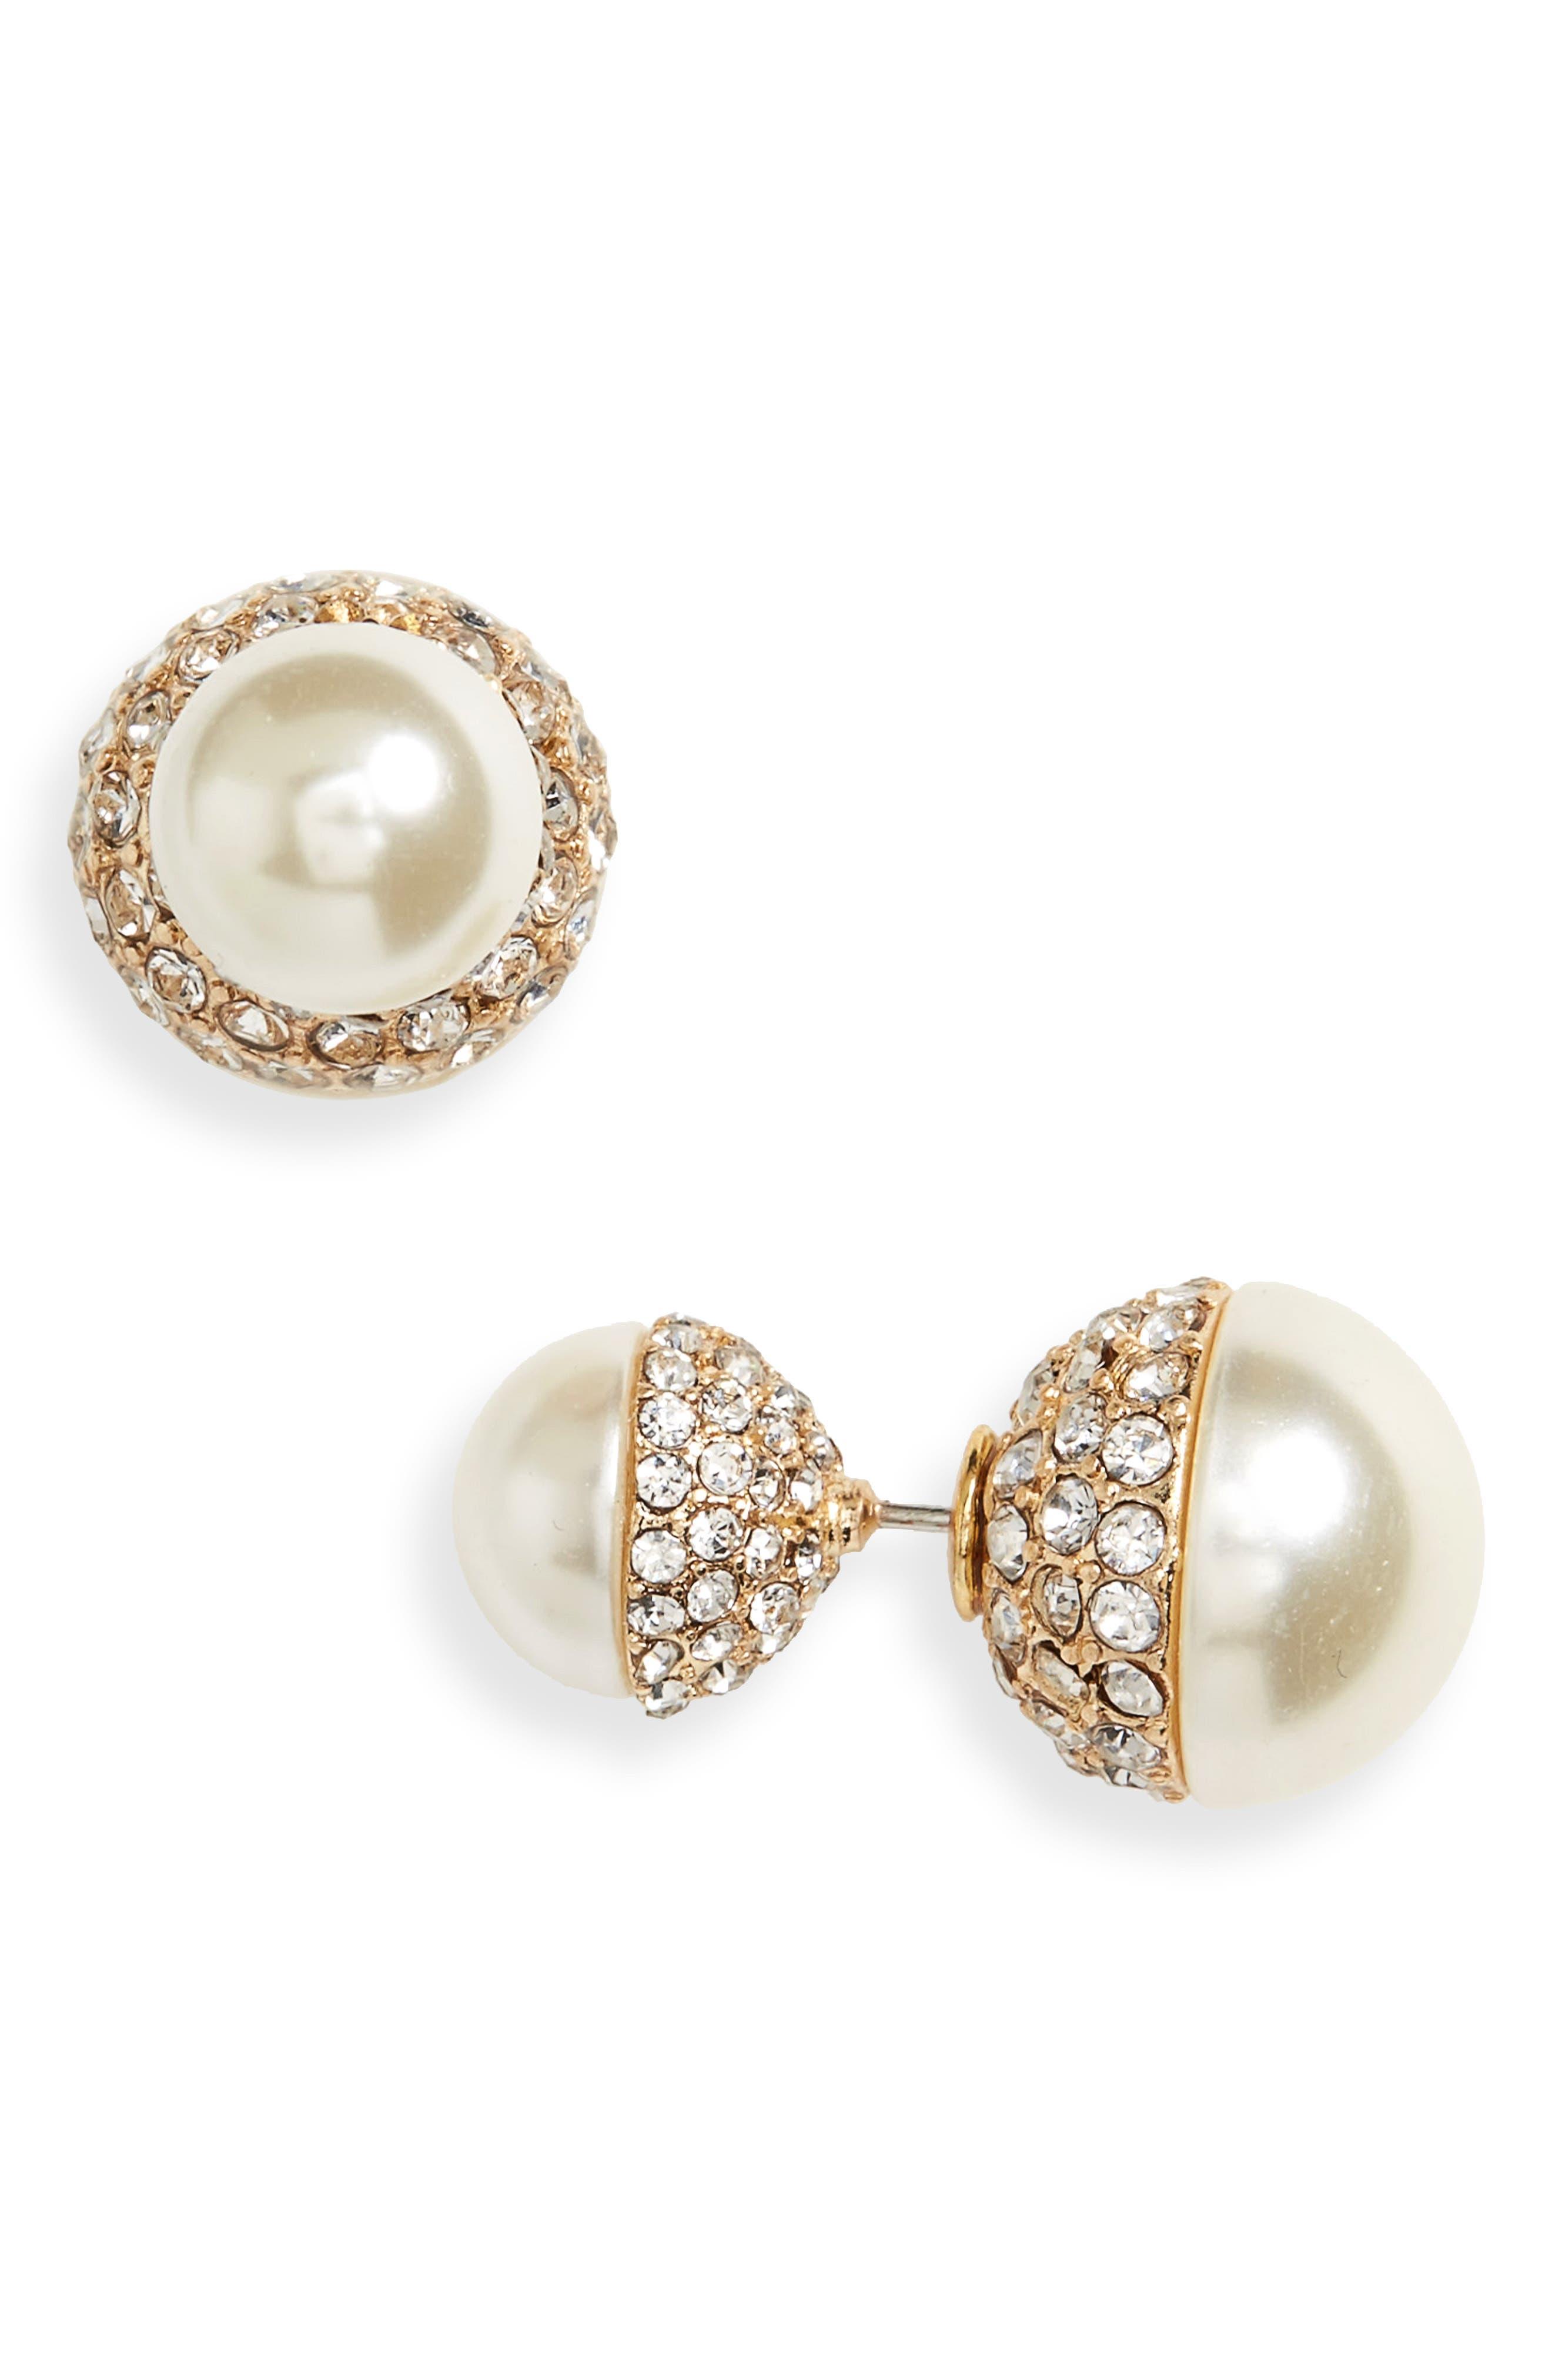 Alternate Image 1 Selected - Cara Imitation Pearl & Crystal Front/Back Earrings